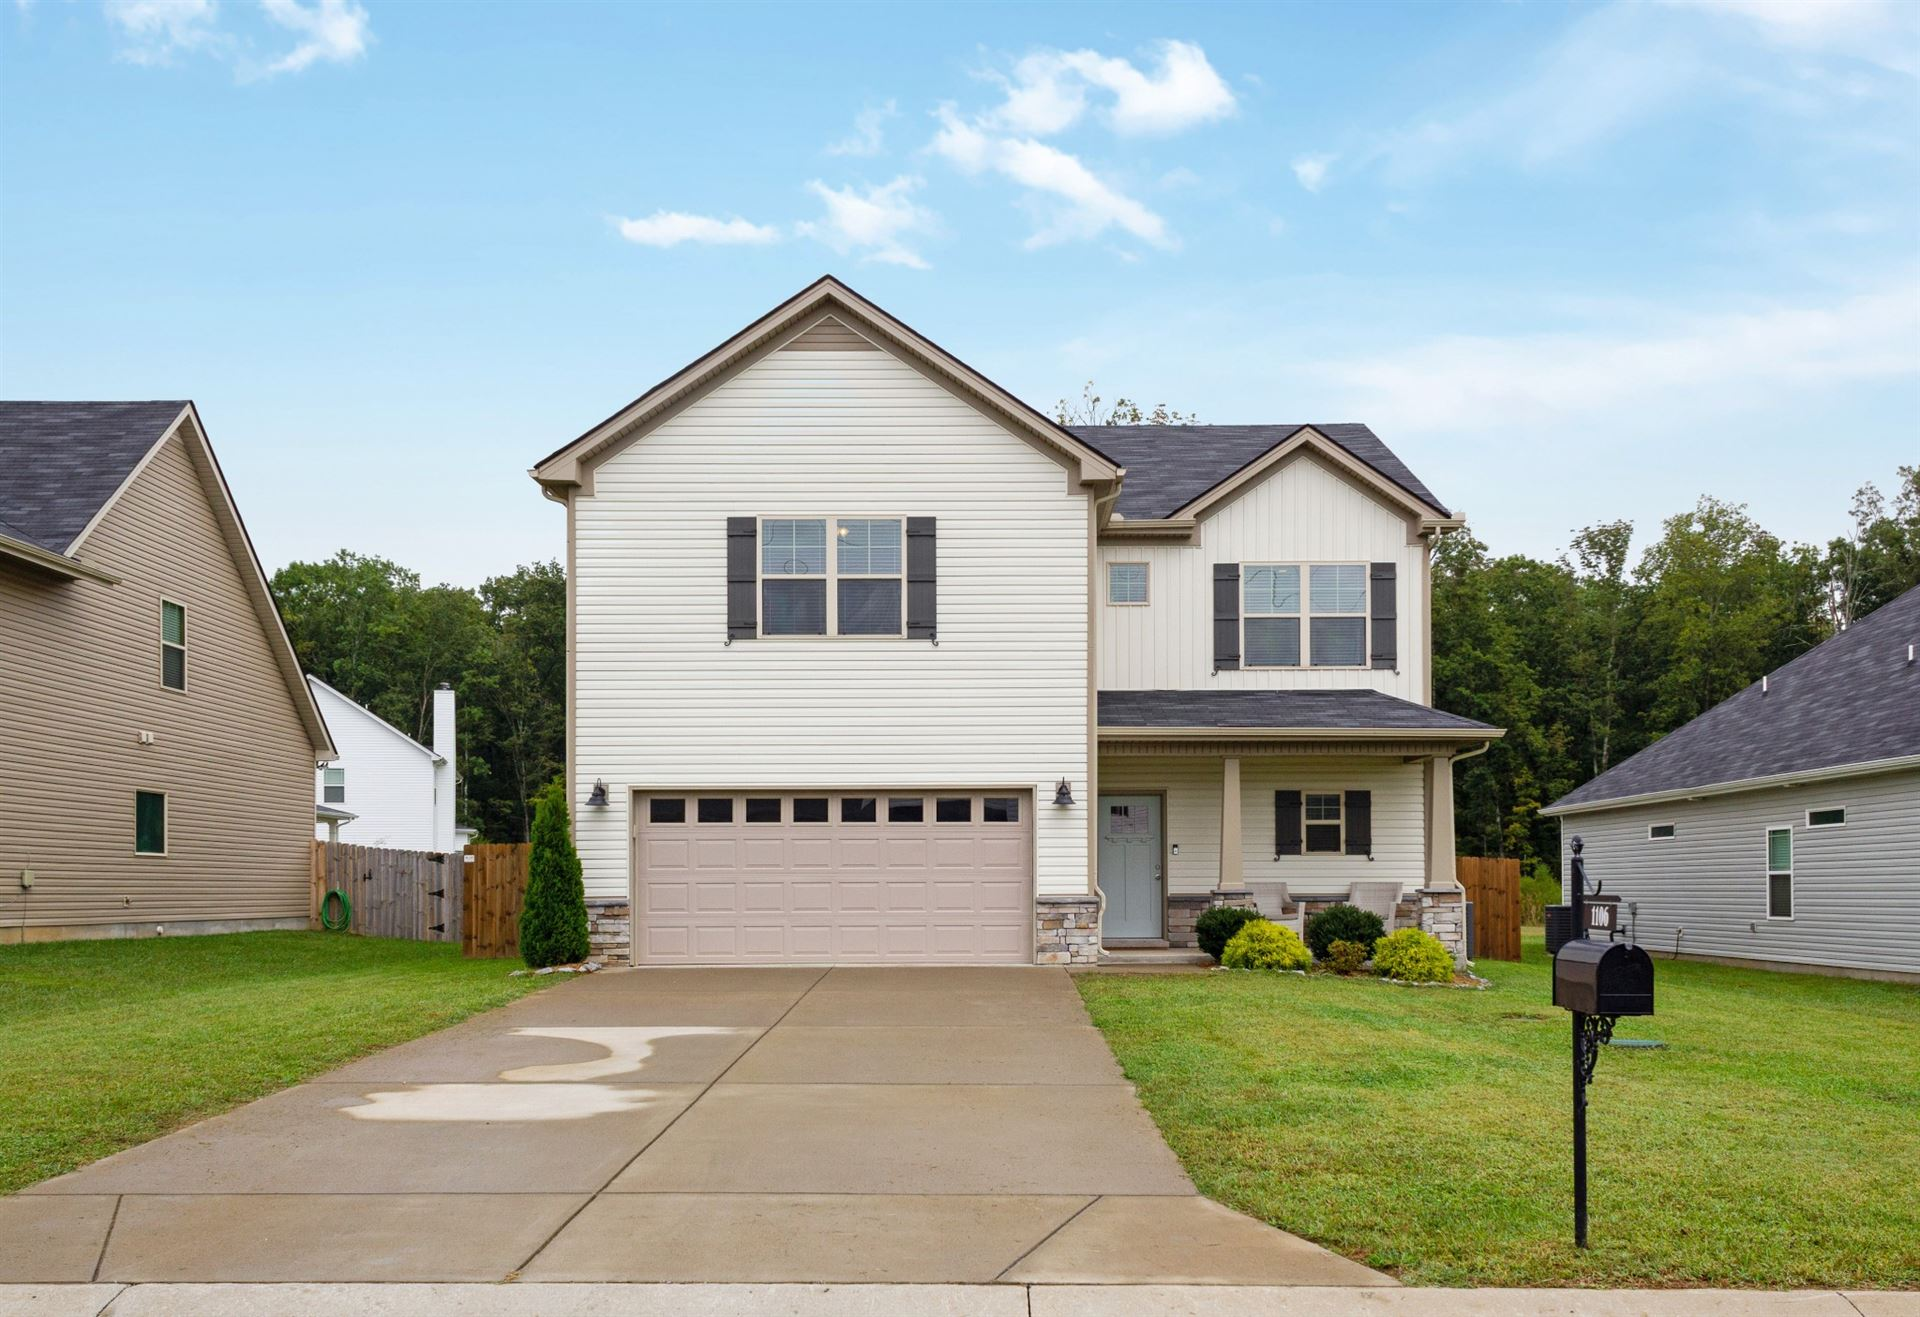 1106 Carrington Pl, Murfreesboro, TN 37128 - MLS#: 2193740